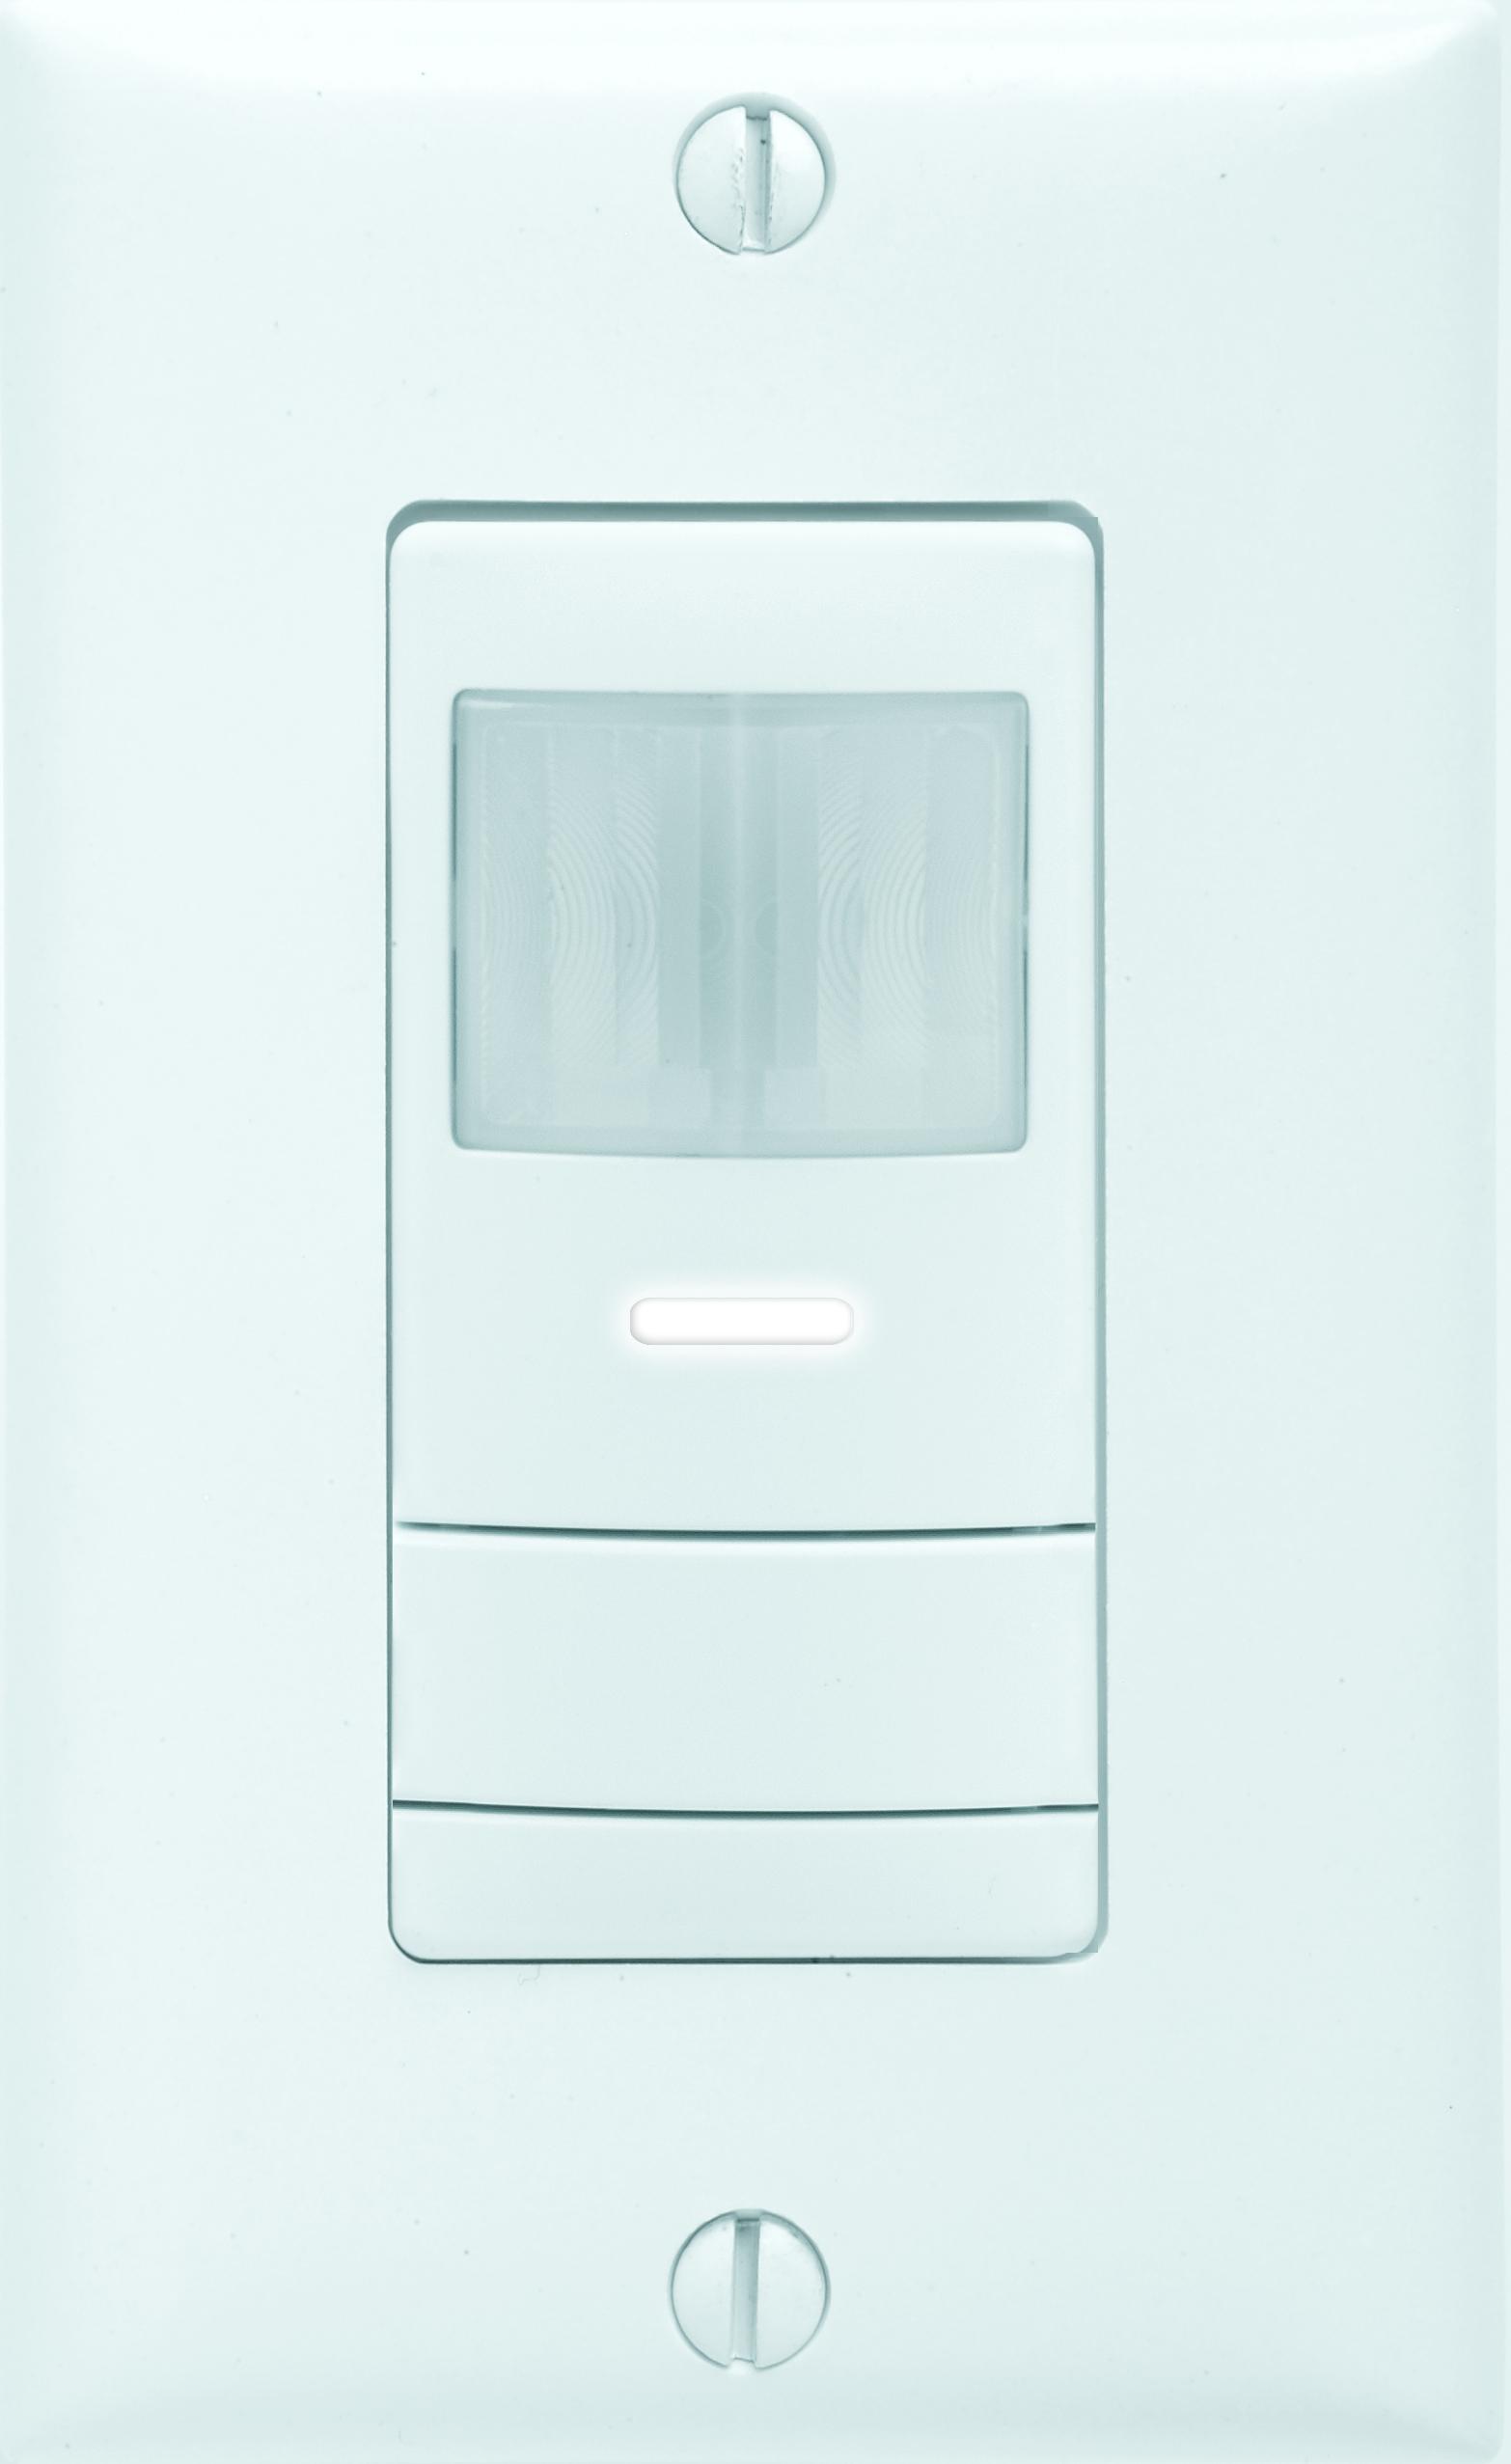 Sensor Switch,WSX PDT WH,Lithonia Lighting® Sensor Switch® WSX Decorator Style Single Relay Wall Switch Occupancy Sensor, 120/277 VAC, PDT Sensor